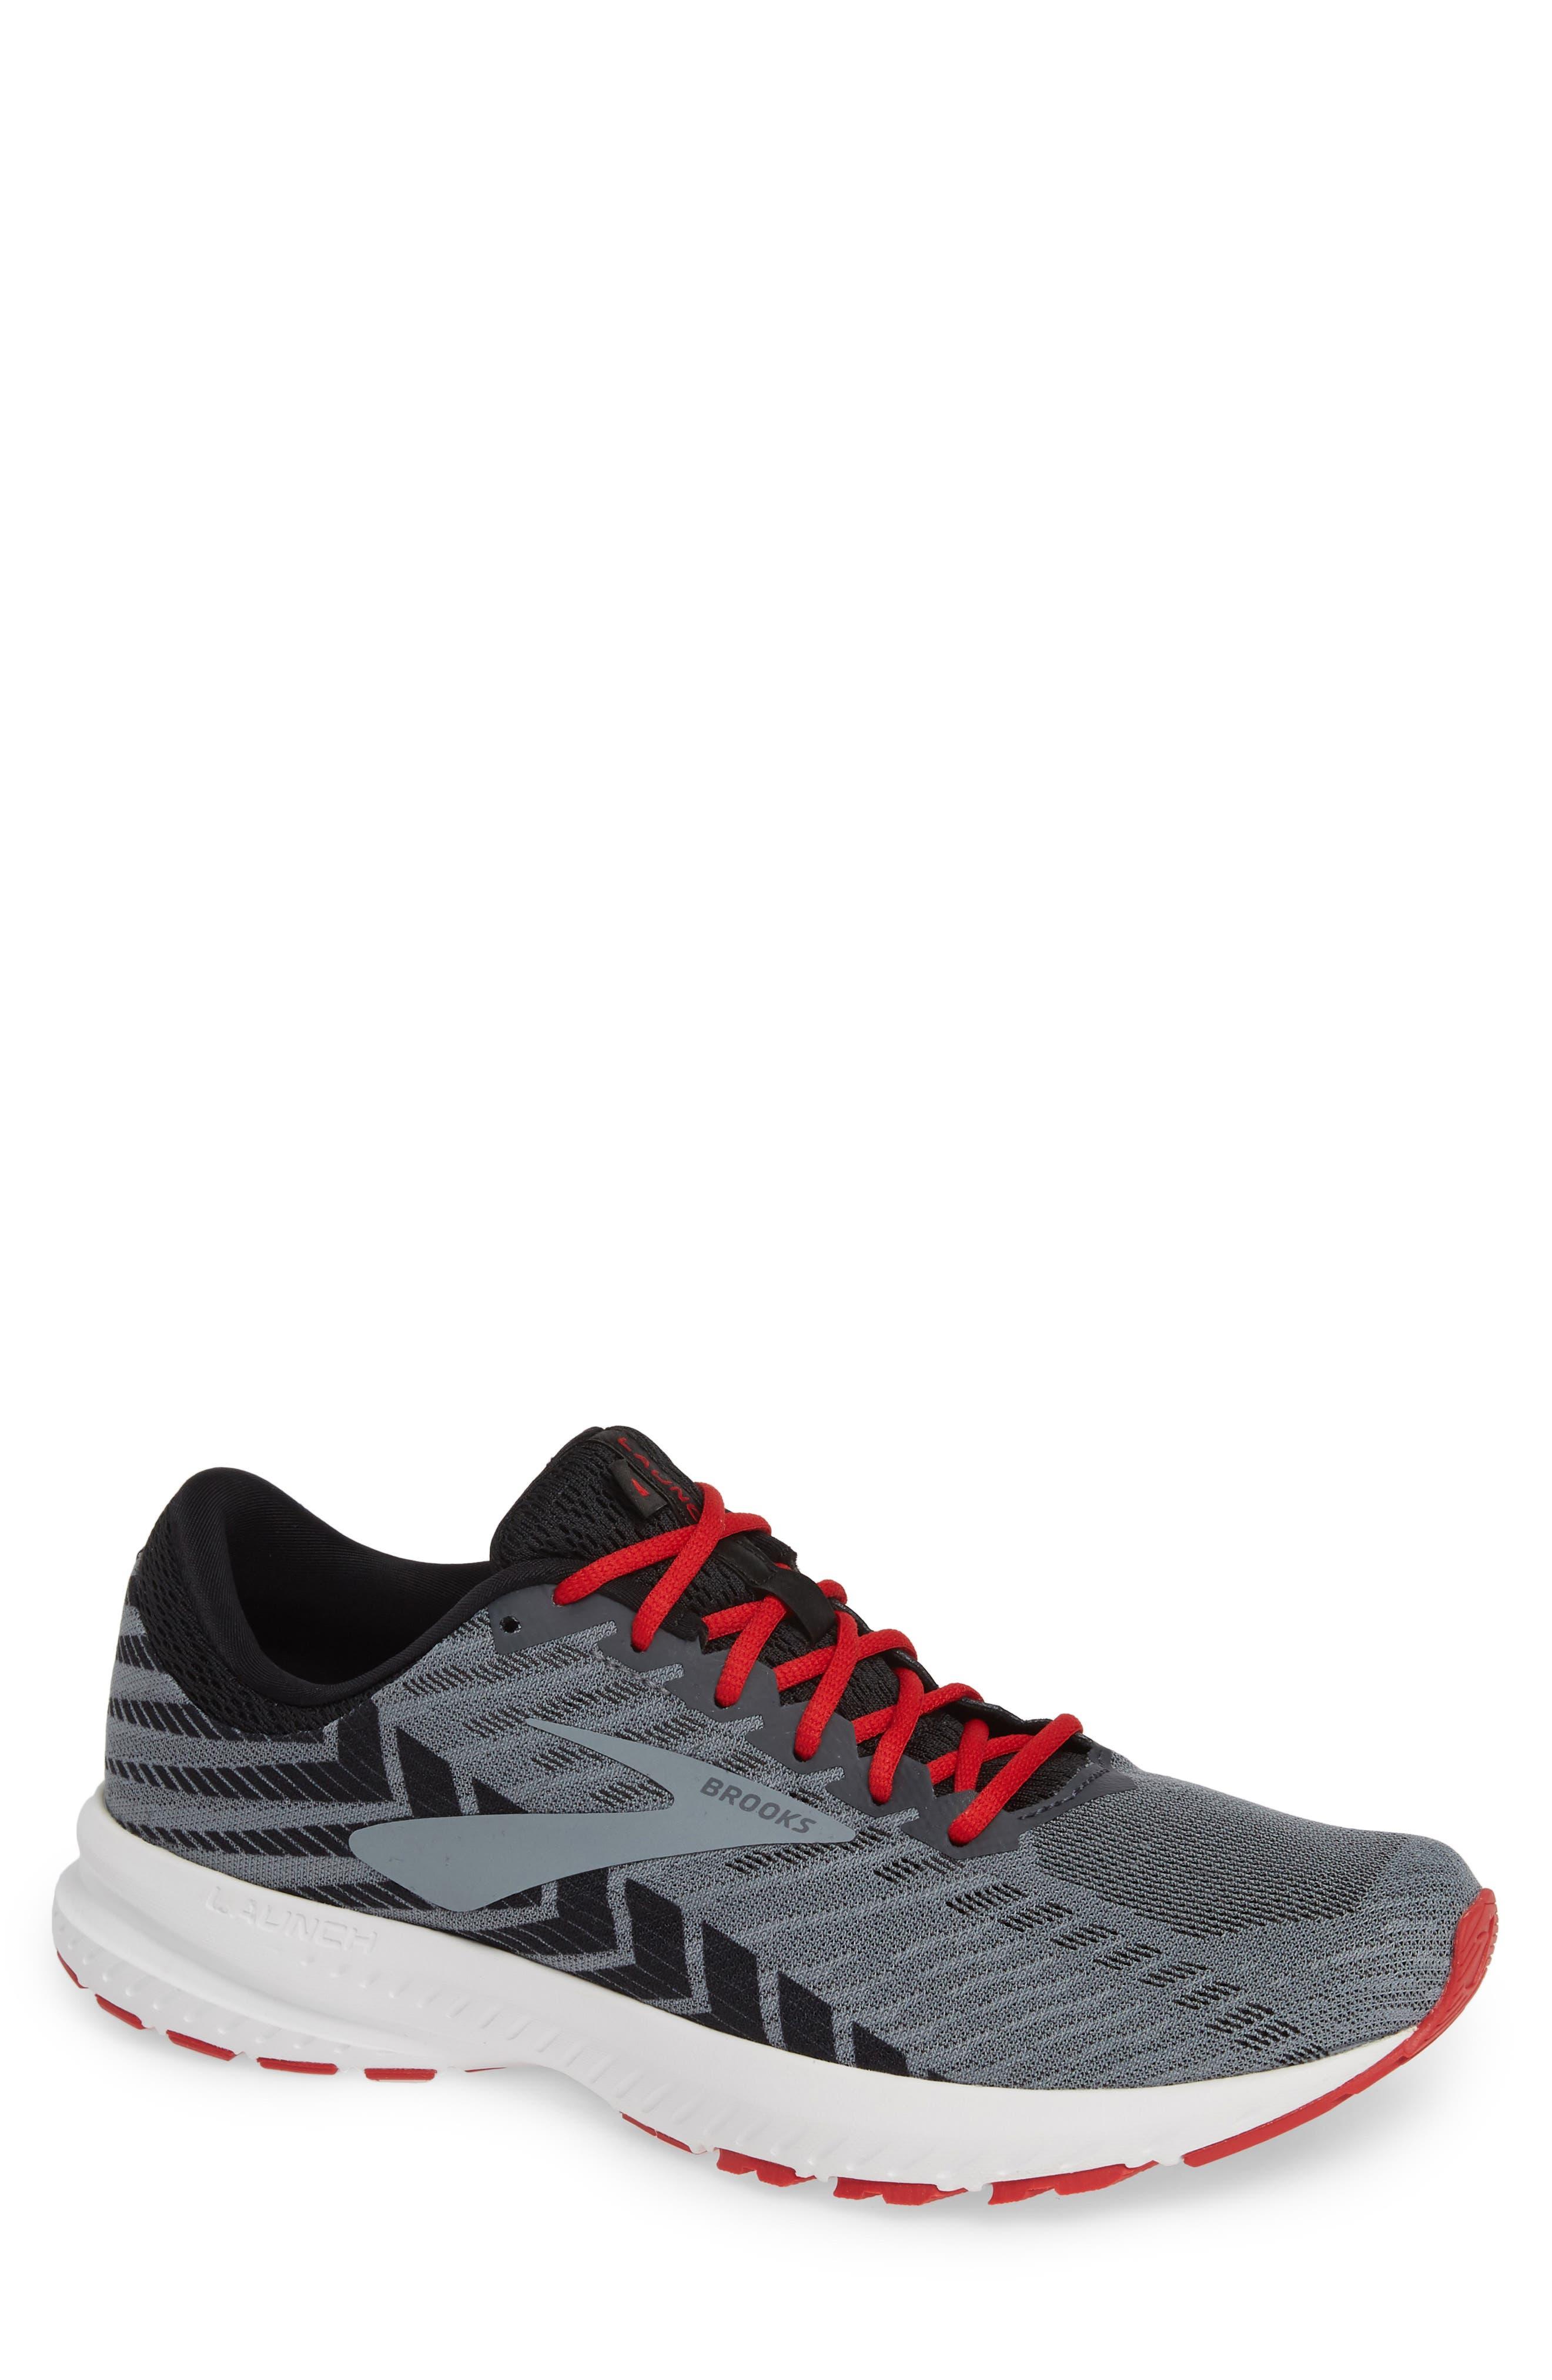 Brooks Launch 6 Running Shoe - Grey